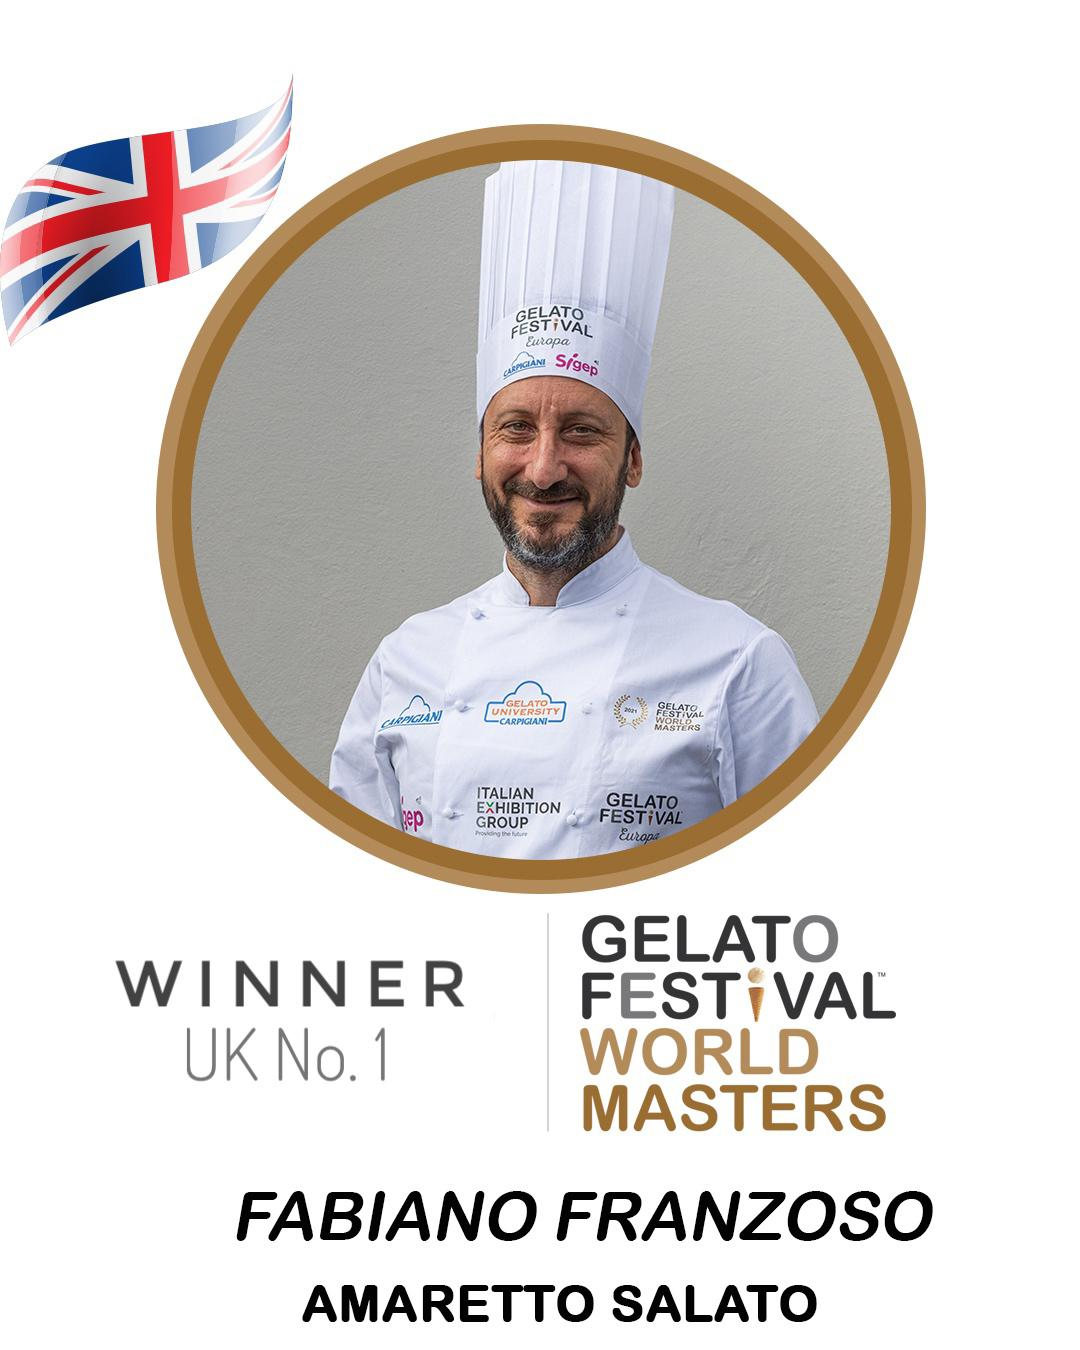 Winner UK cremoloso gelato Gelato Festival World Master